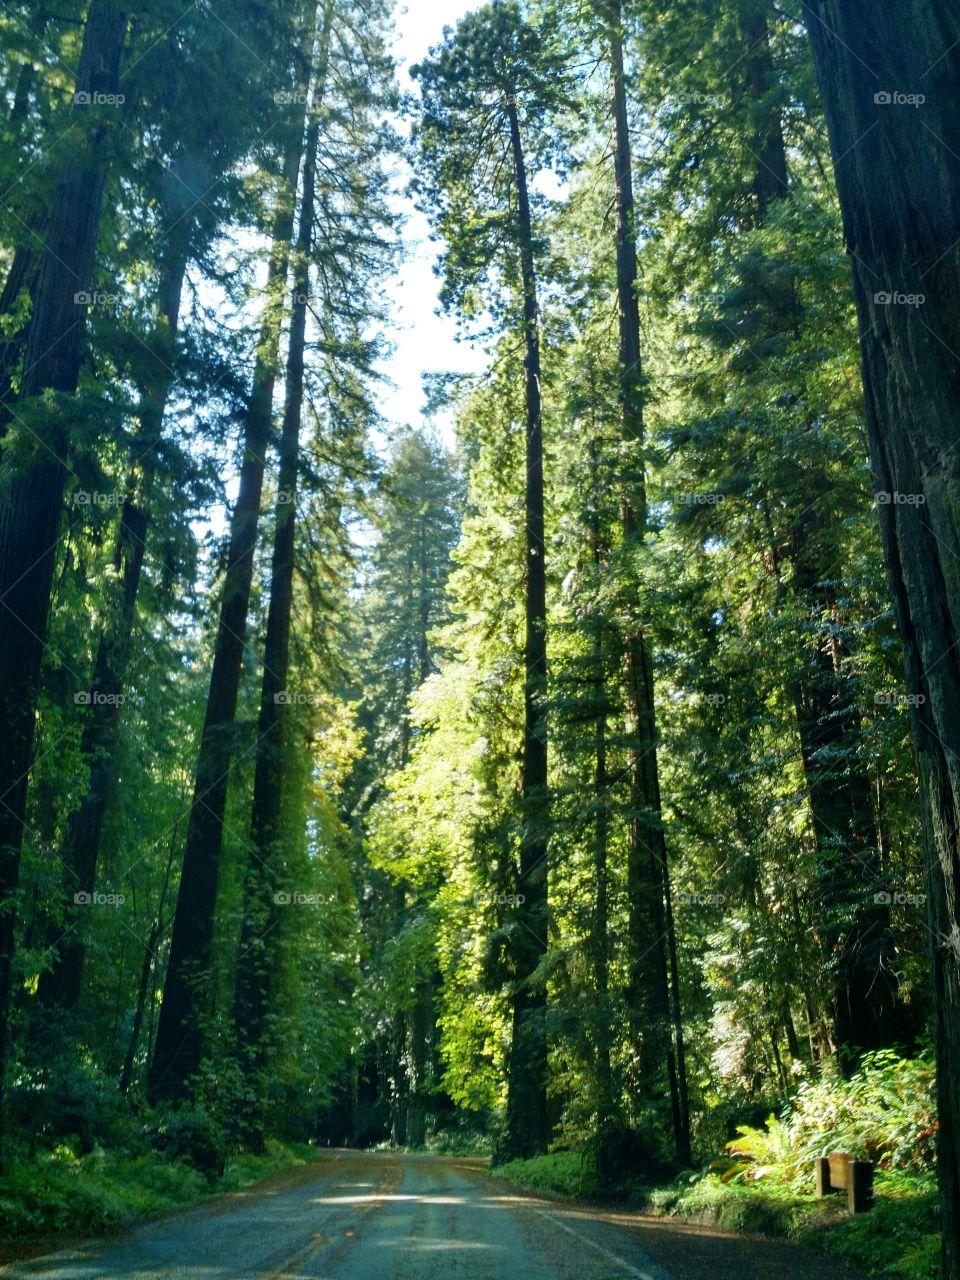 Humbolt Redwoods. August 2015